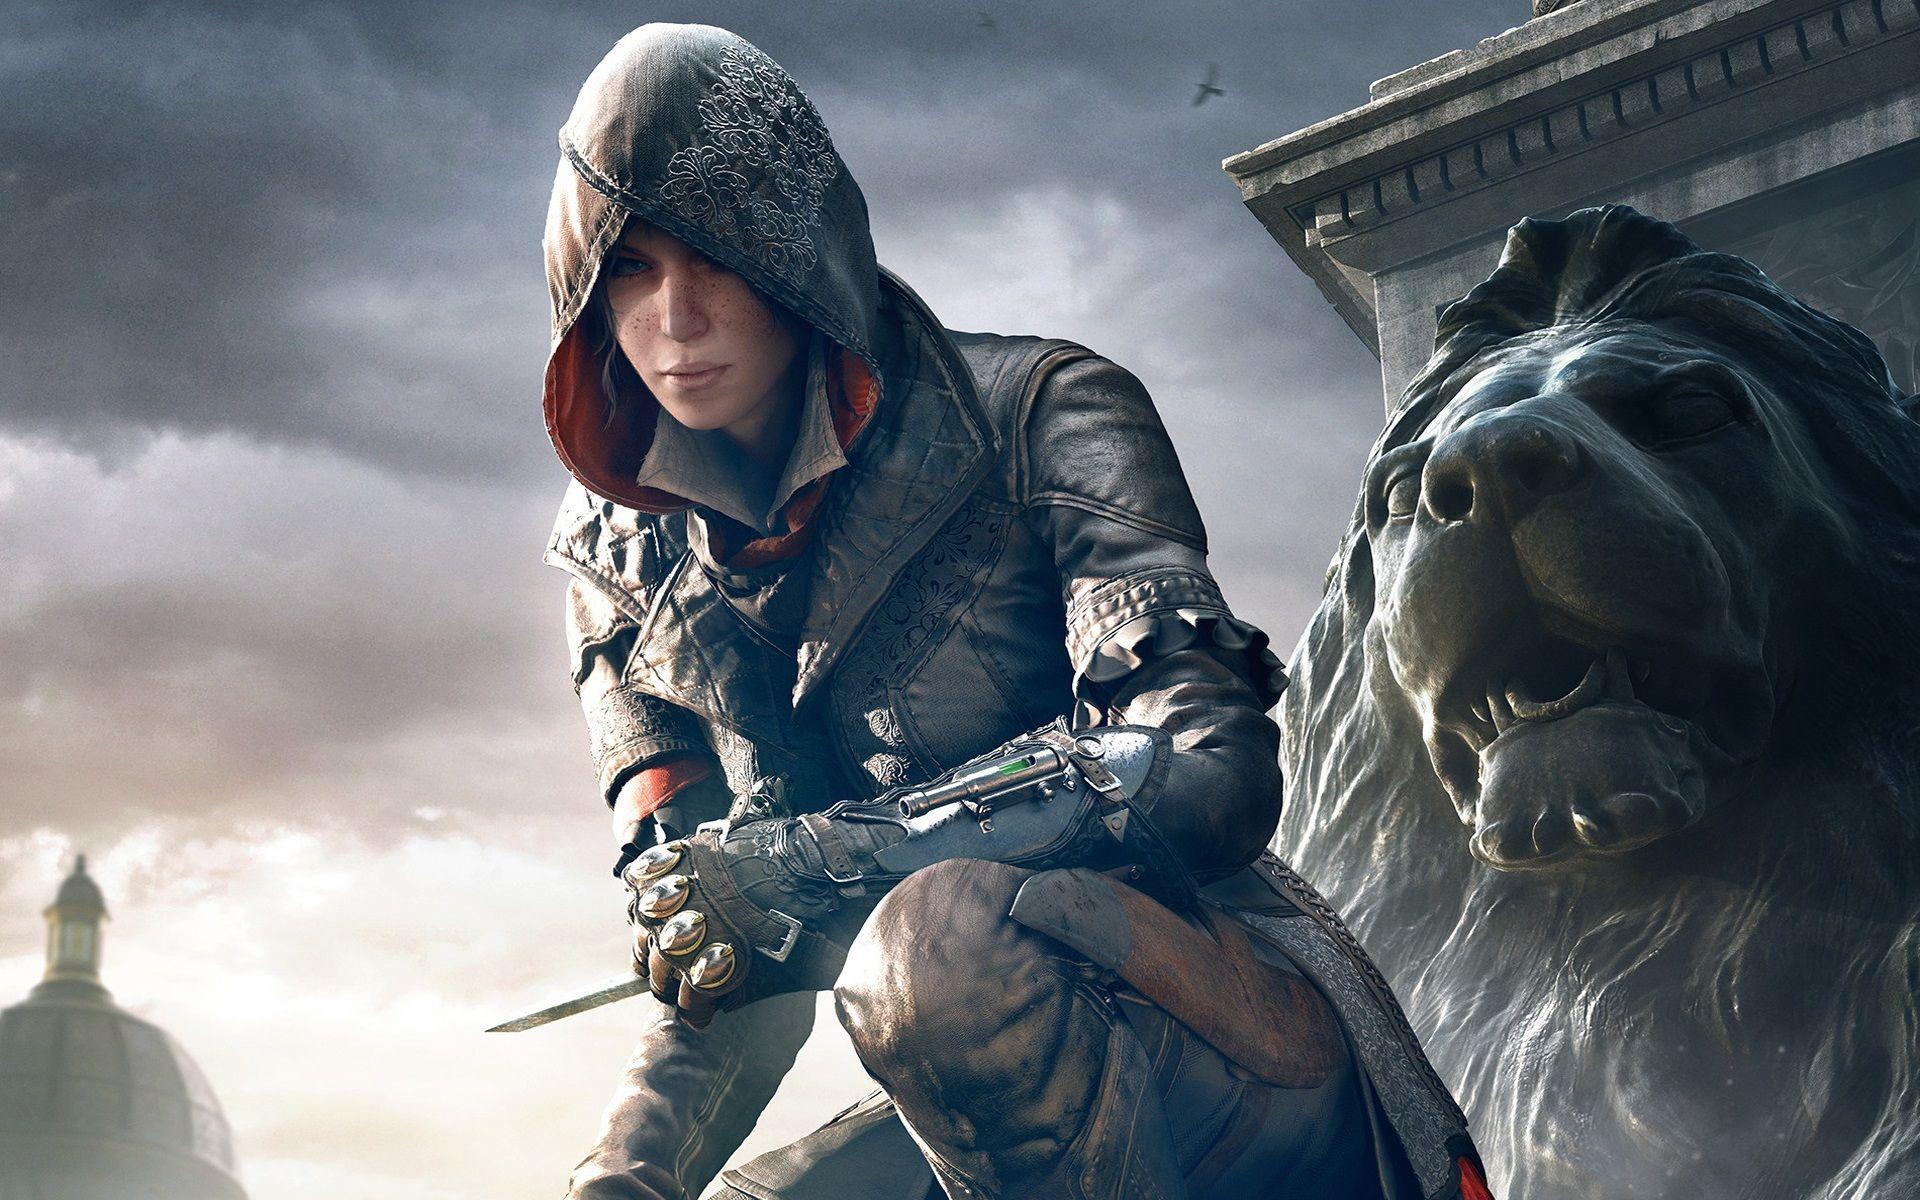 Assassin Girl Wallpapers Top Free Assassin Girl Backgrounds